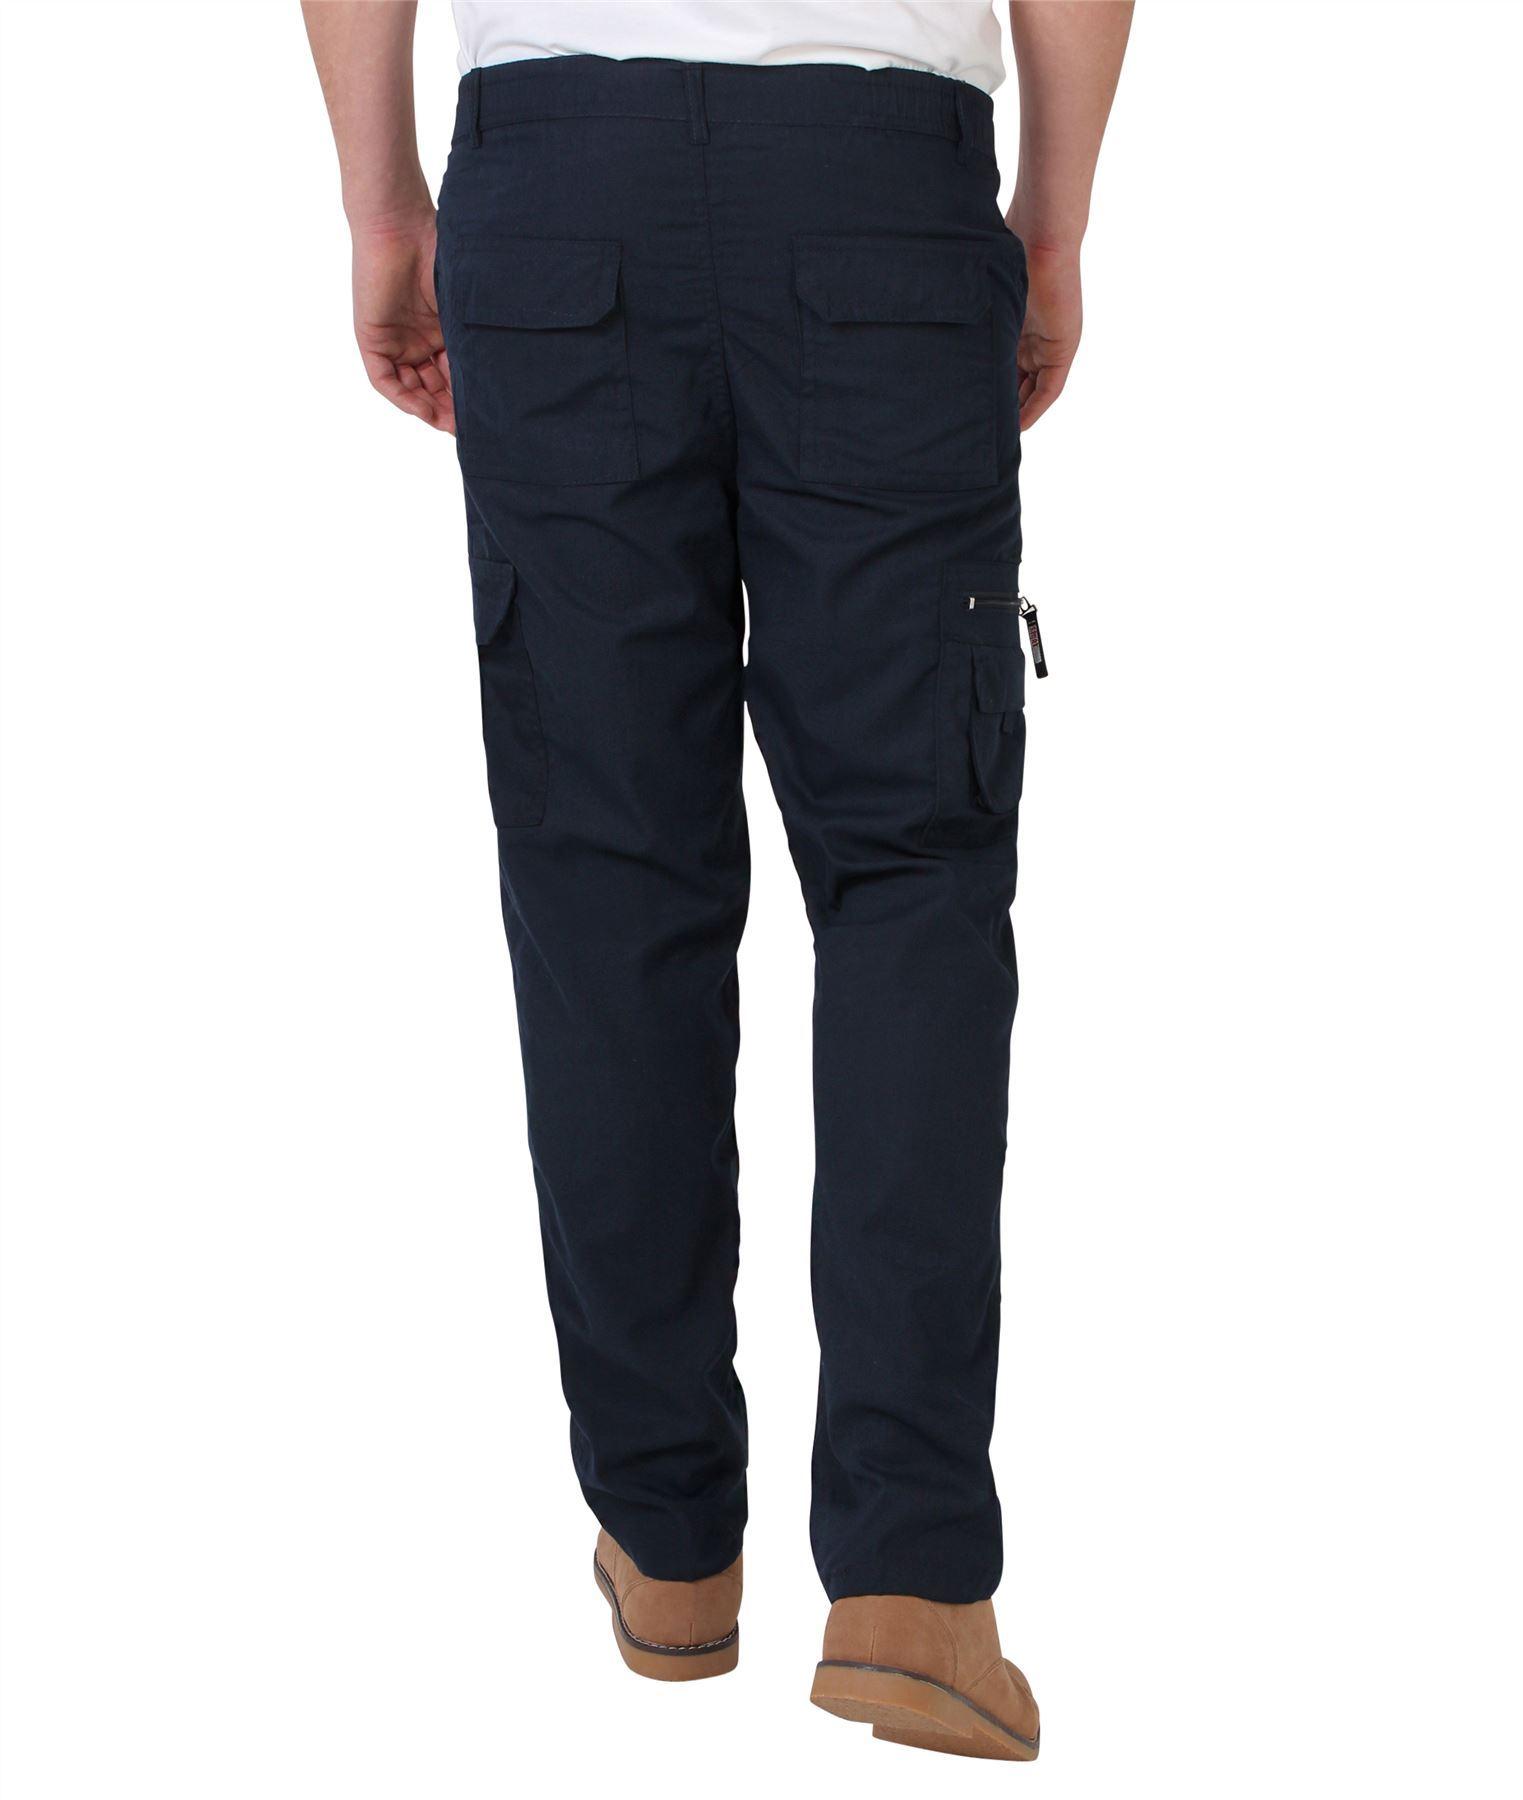 Pantalones-Hombre-Estilo-Cargo-Militar-Combate-Multibolsillos-Casual miniatura 4